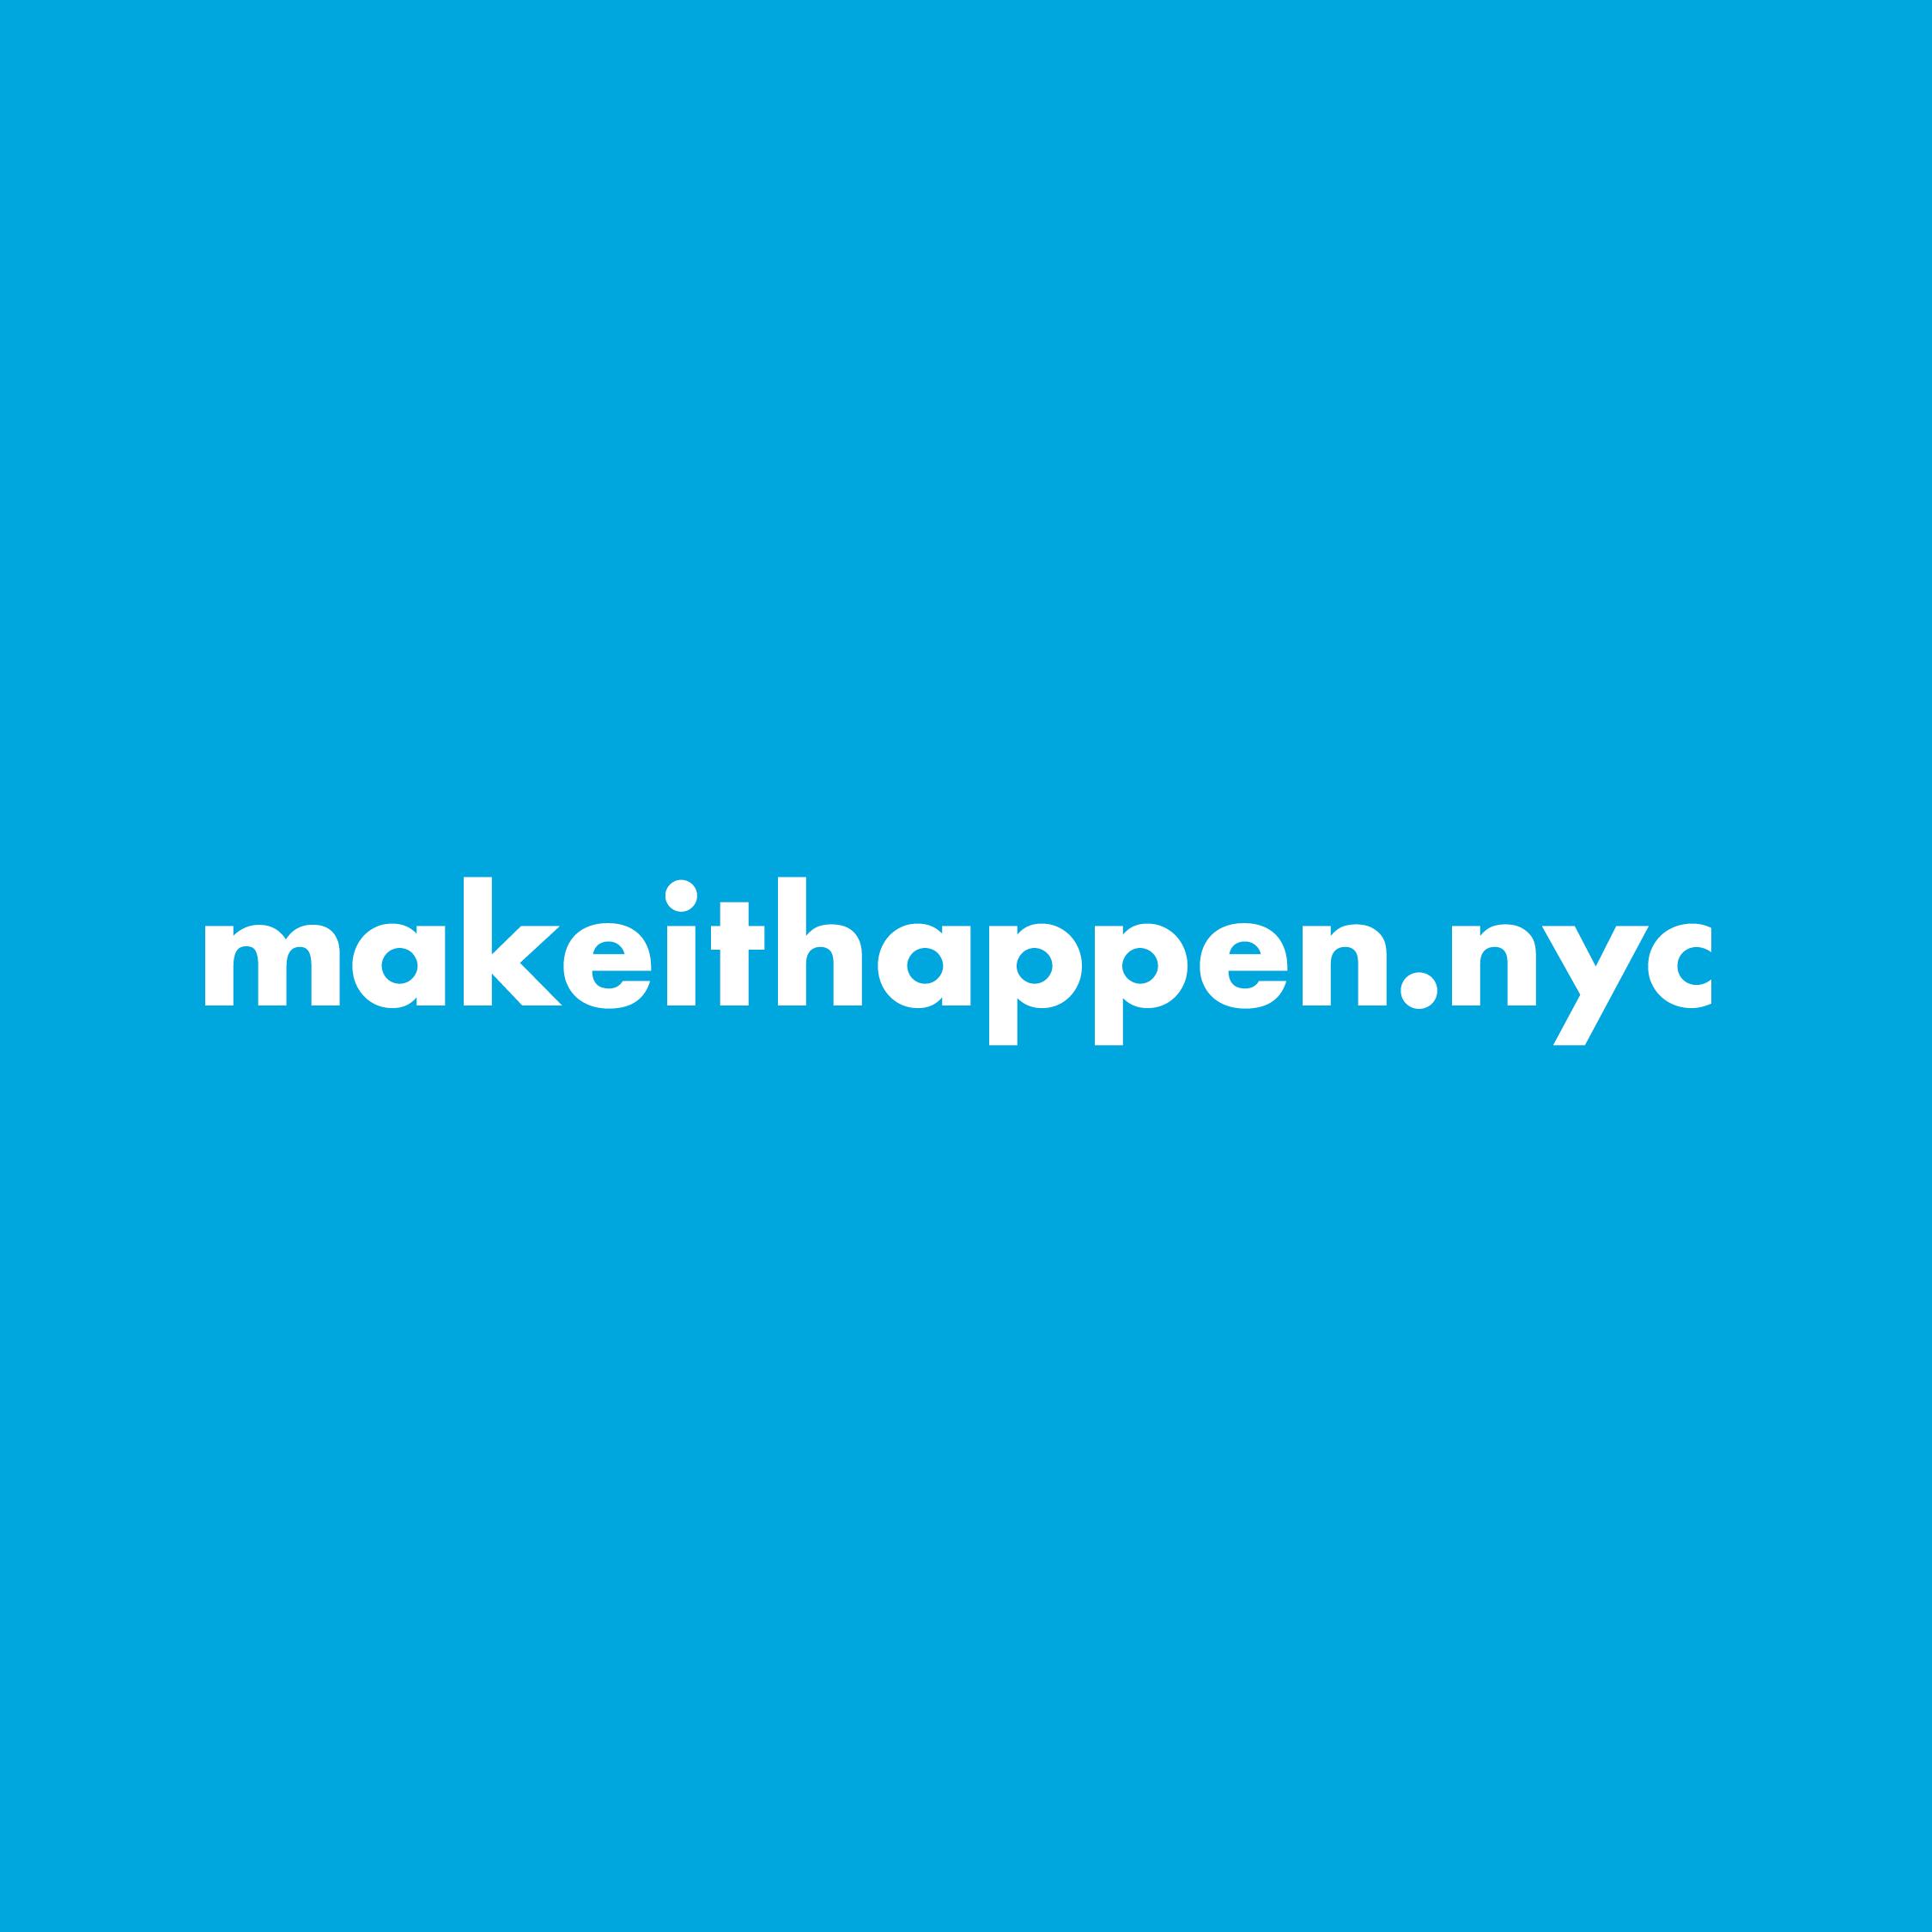 makeithappen.nyc Logo